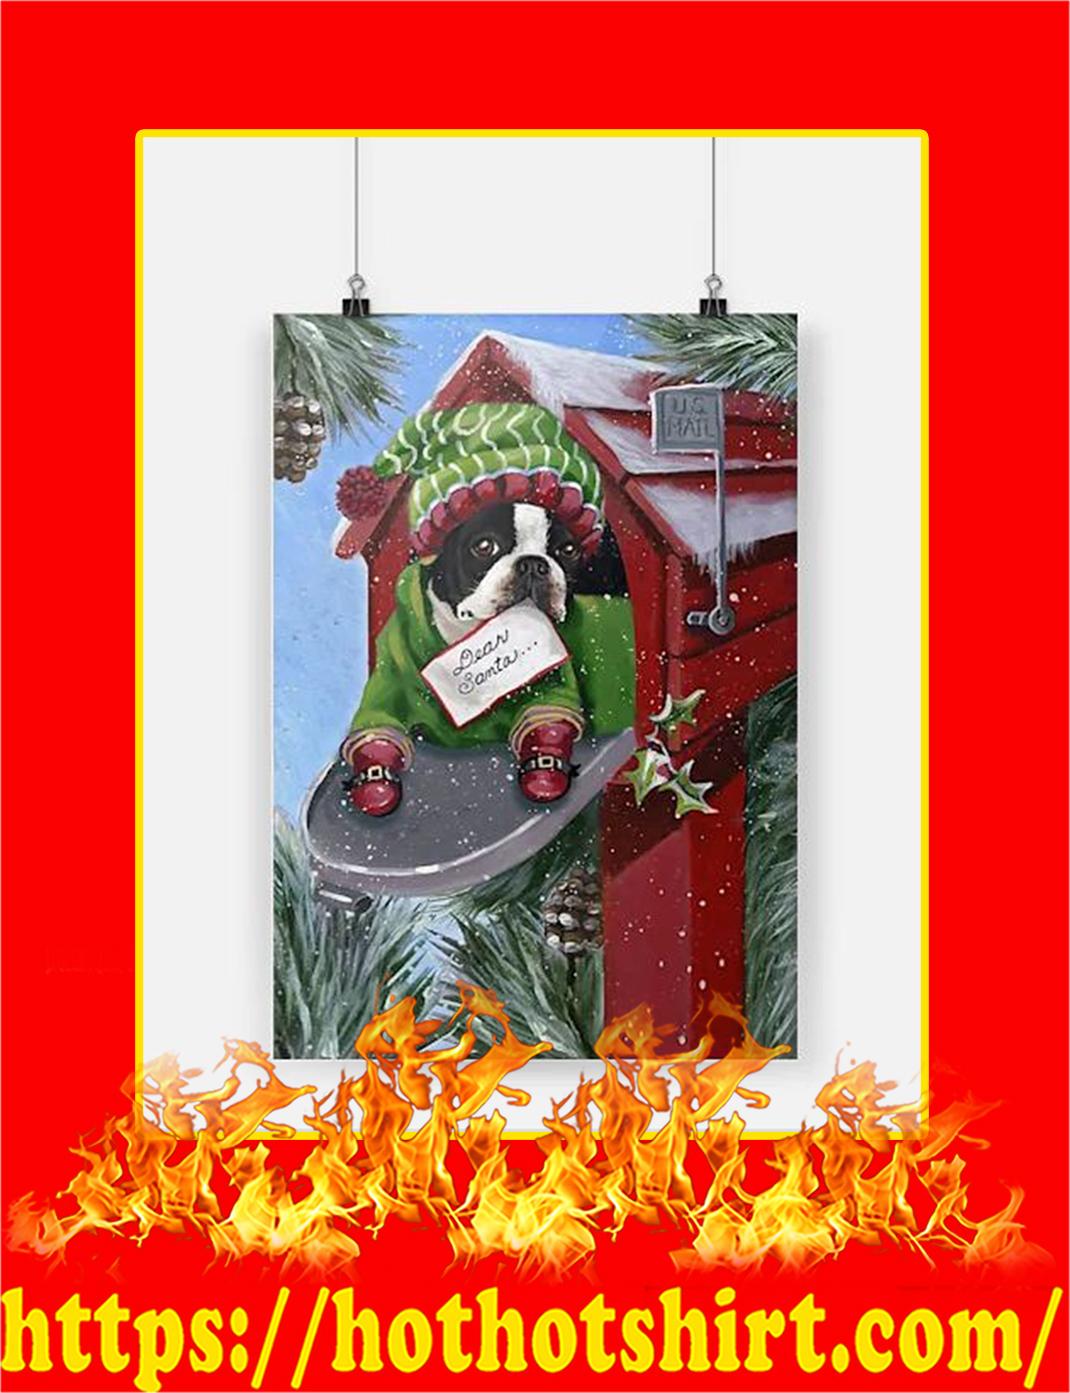 Boston Terrier Dear Santa Poster - A3